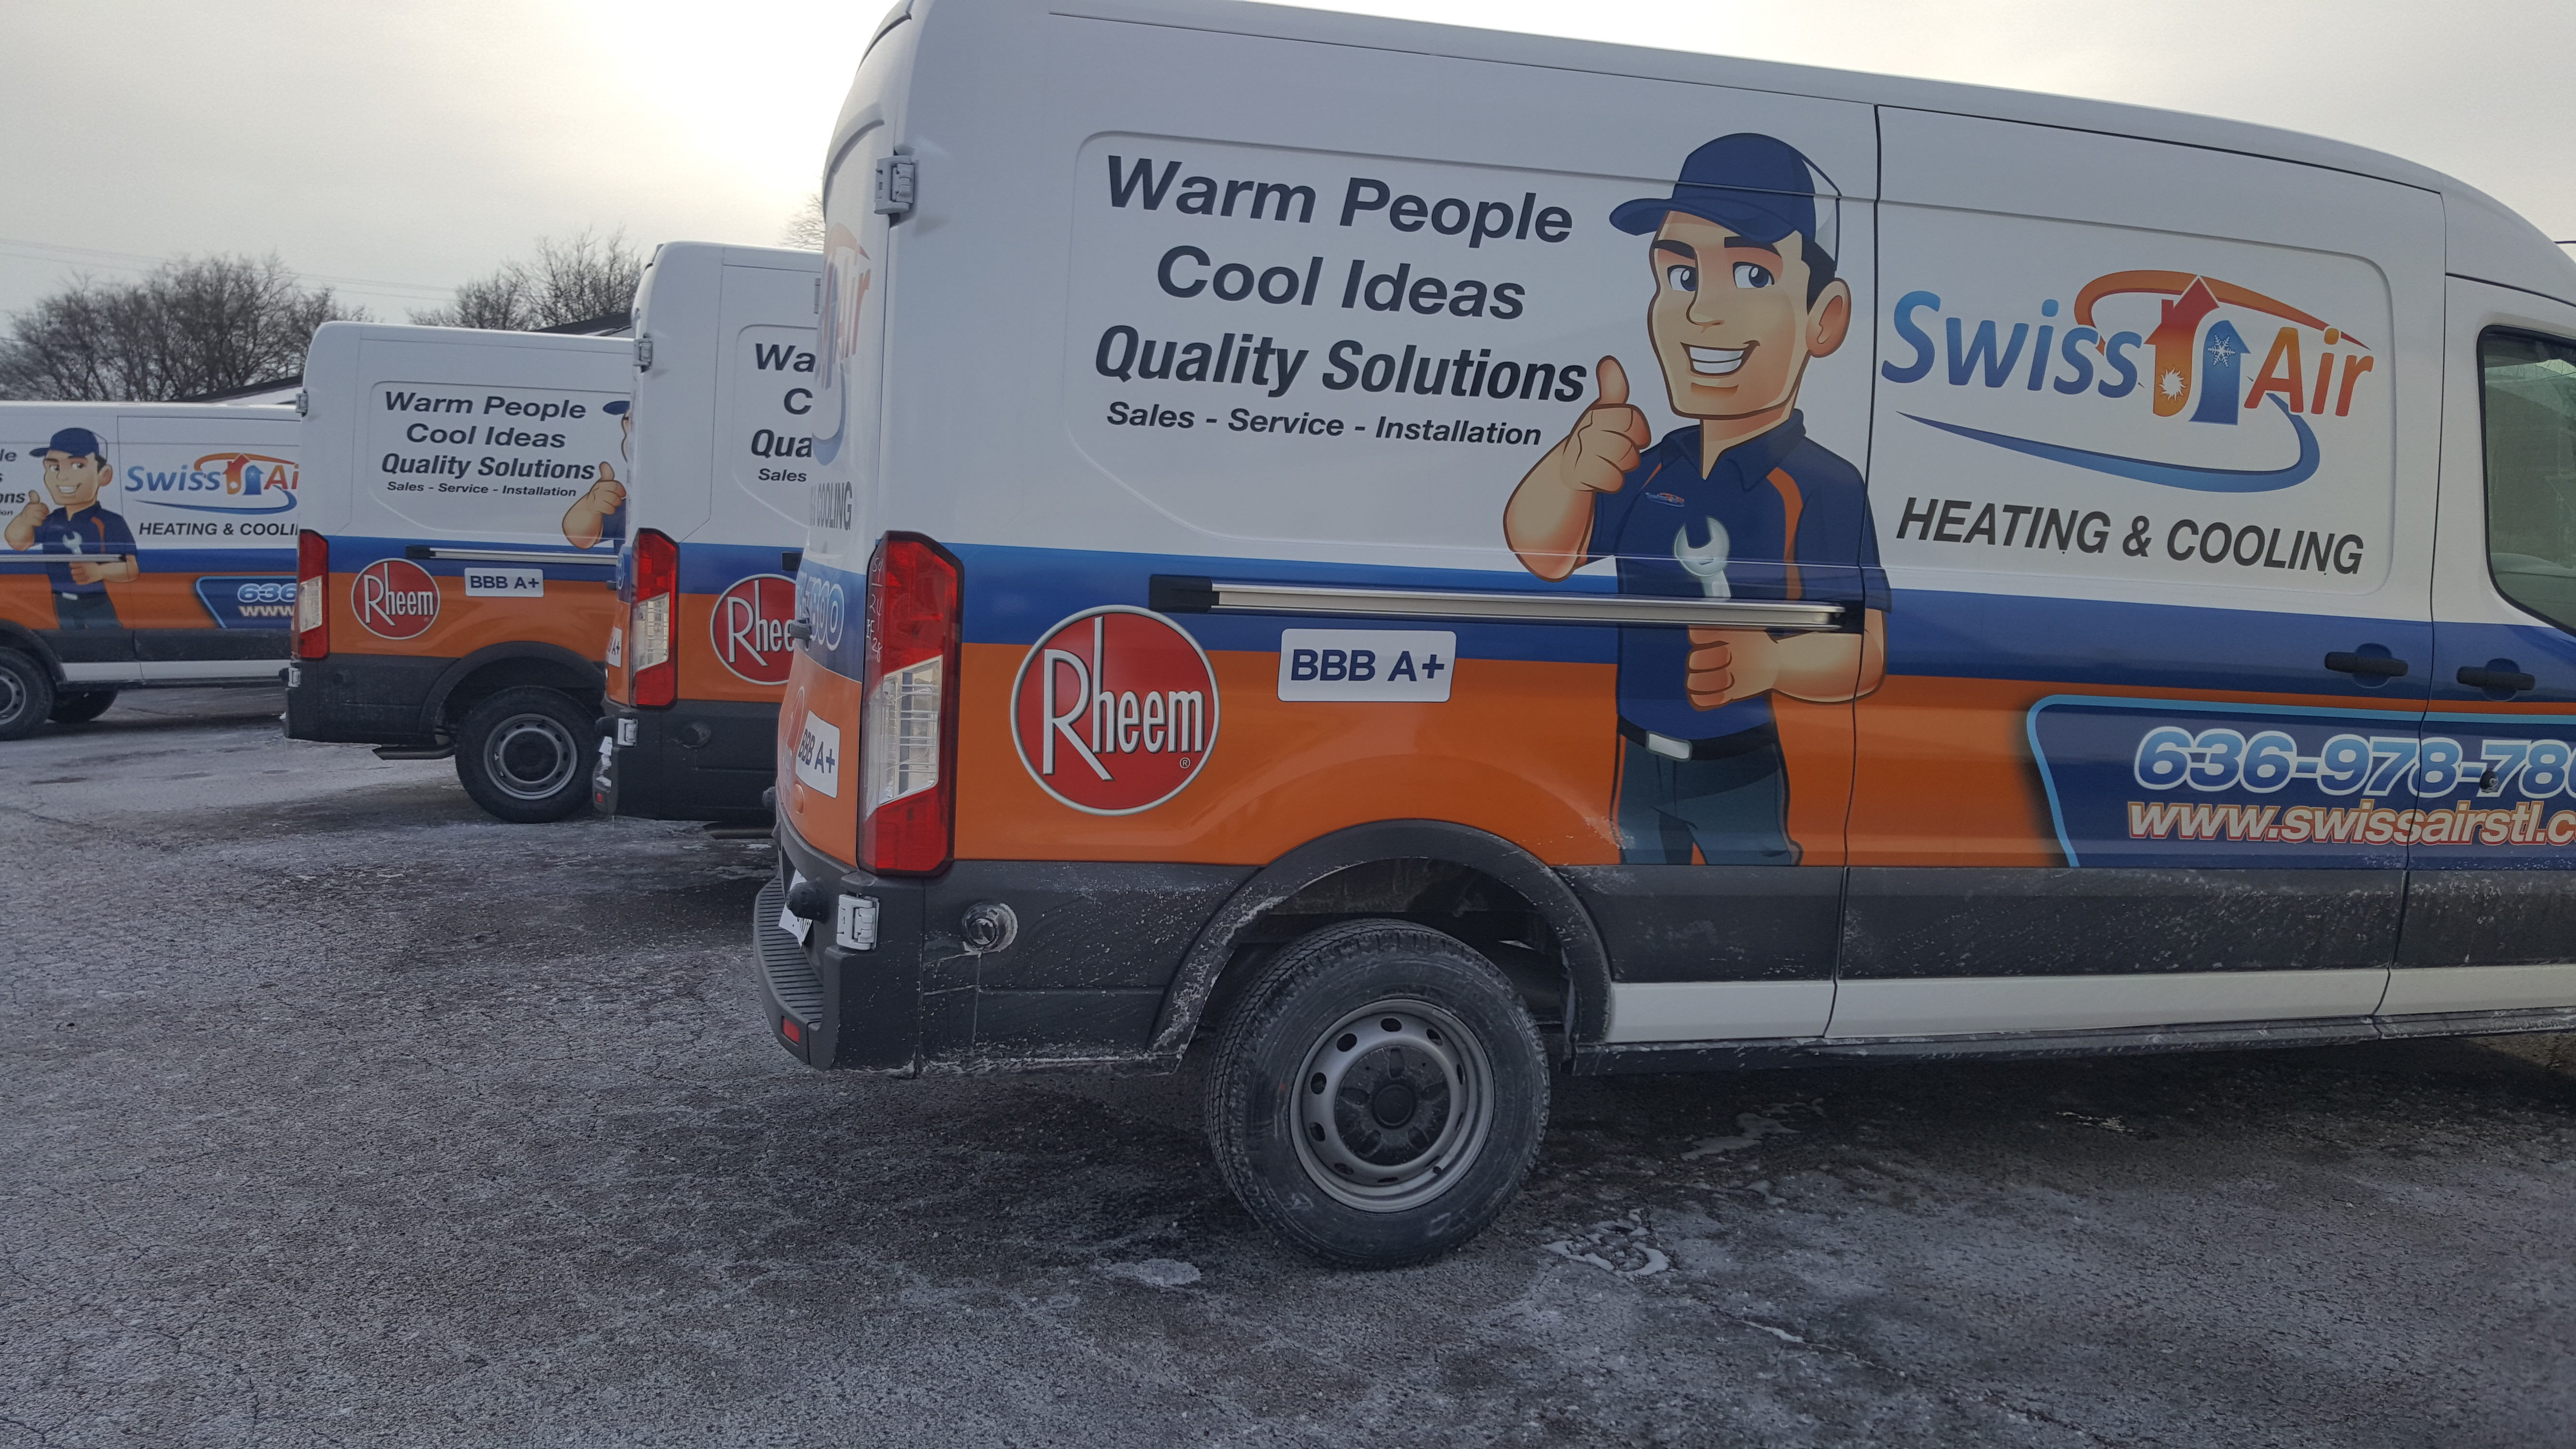 Swiss Air Heating and Cooling, O'Fallon, MO Jobs